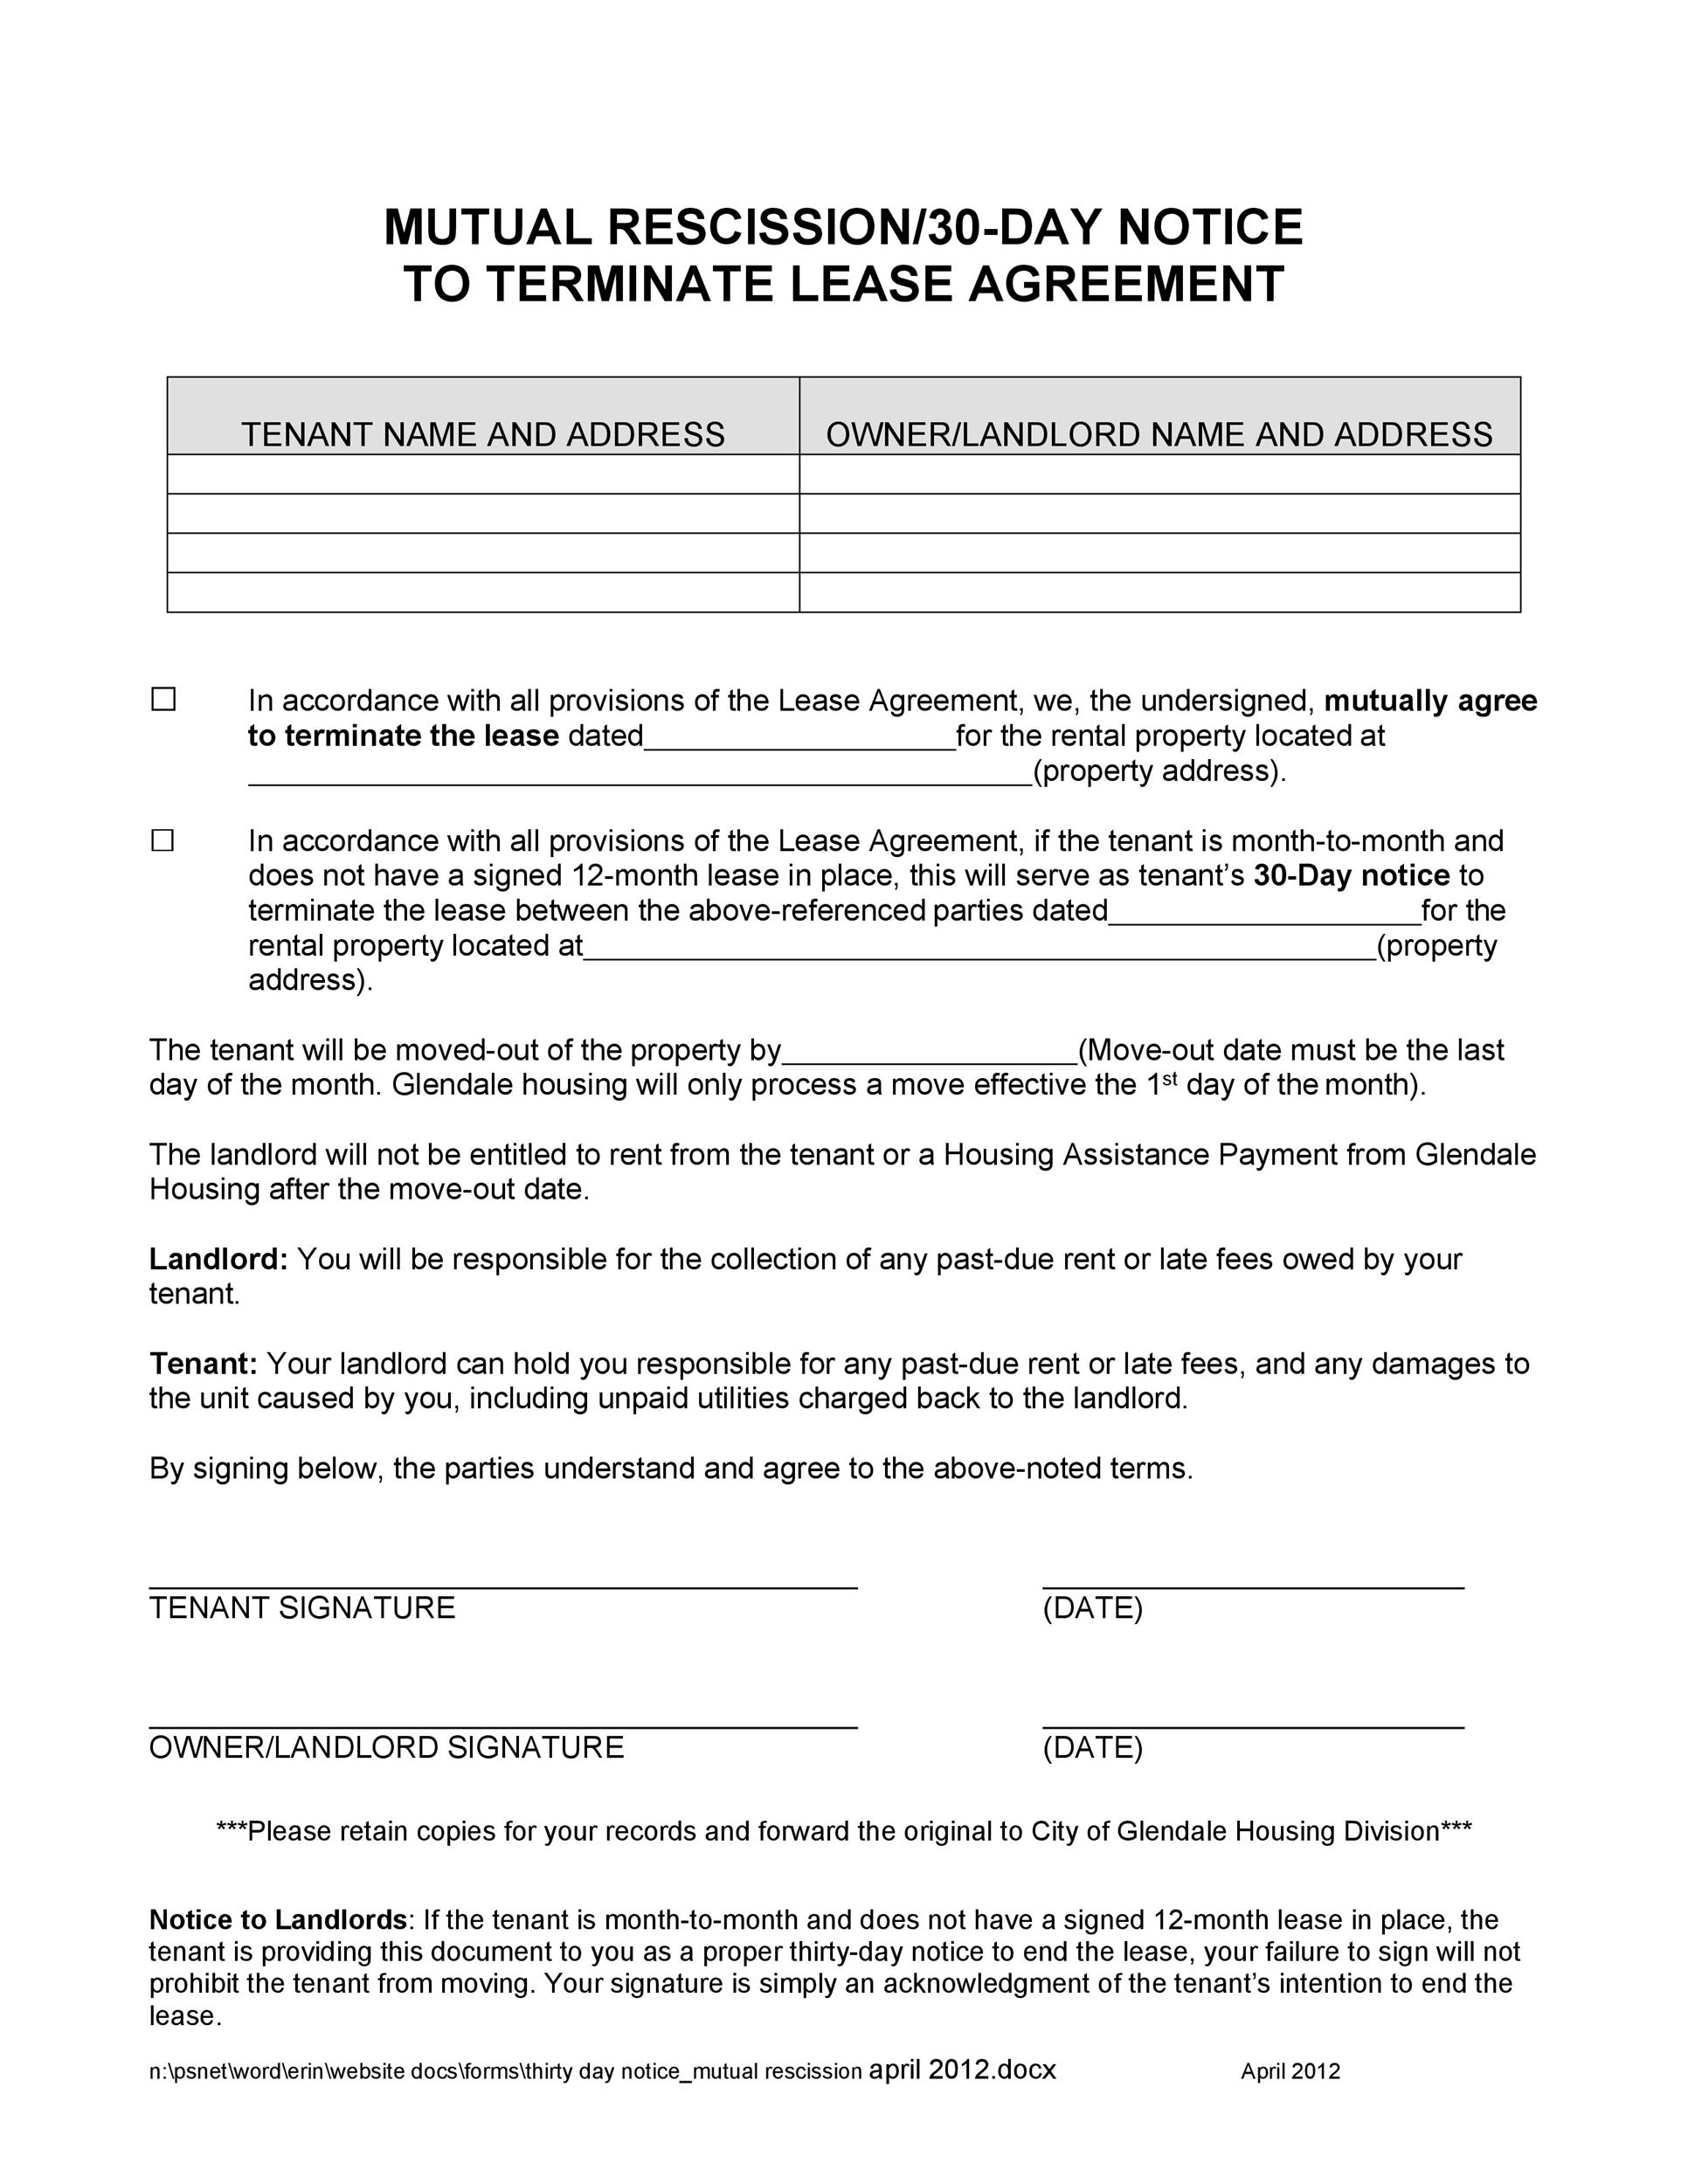 Rescission Agreements